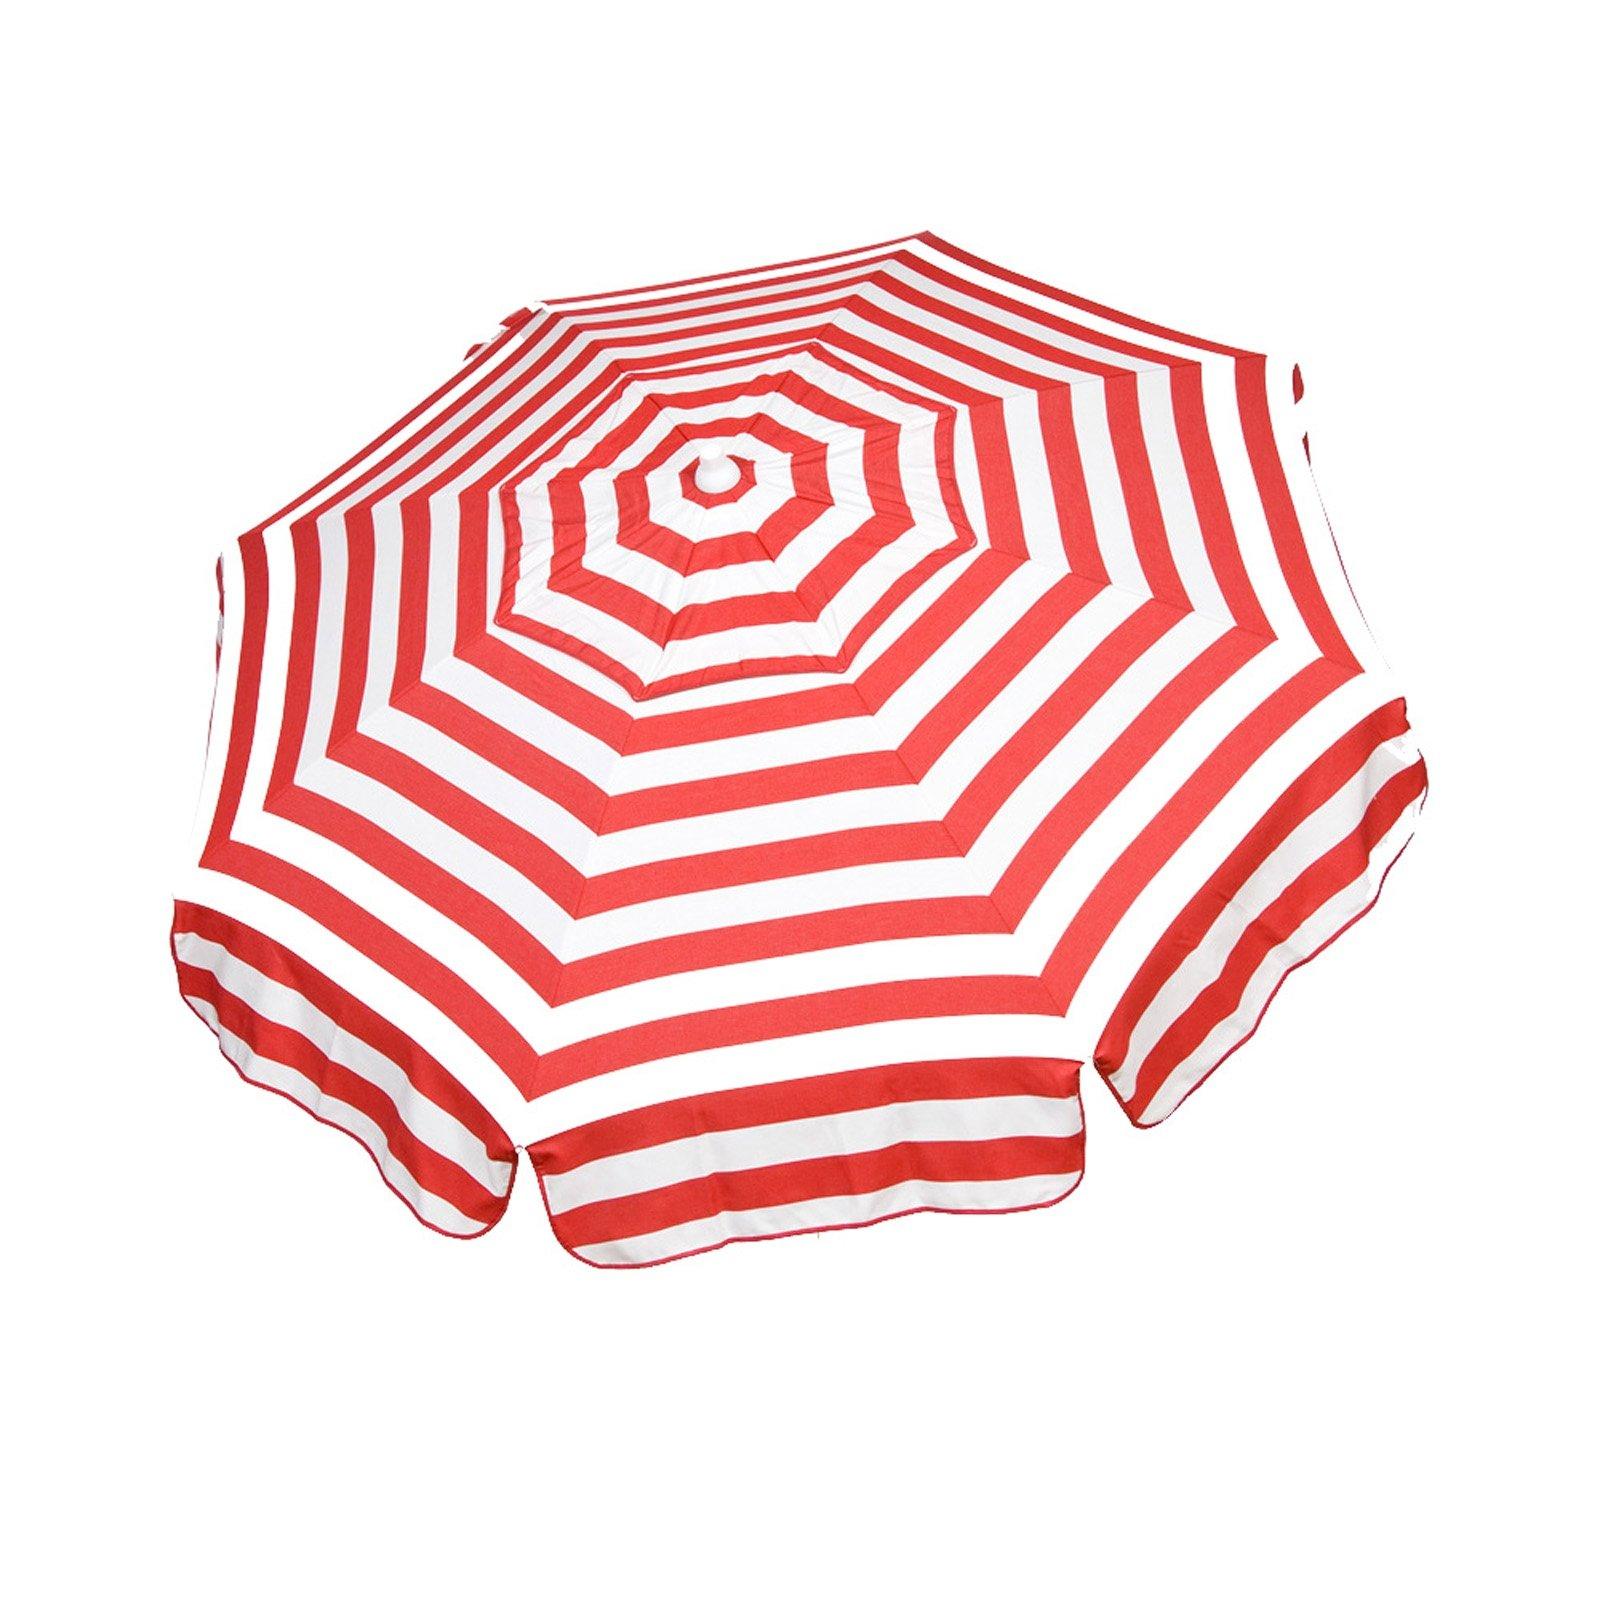 Italian 6 foot Umbrella Acrylic Stripes Red and White Beach Pole 2 Pack Set